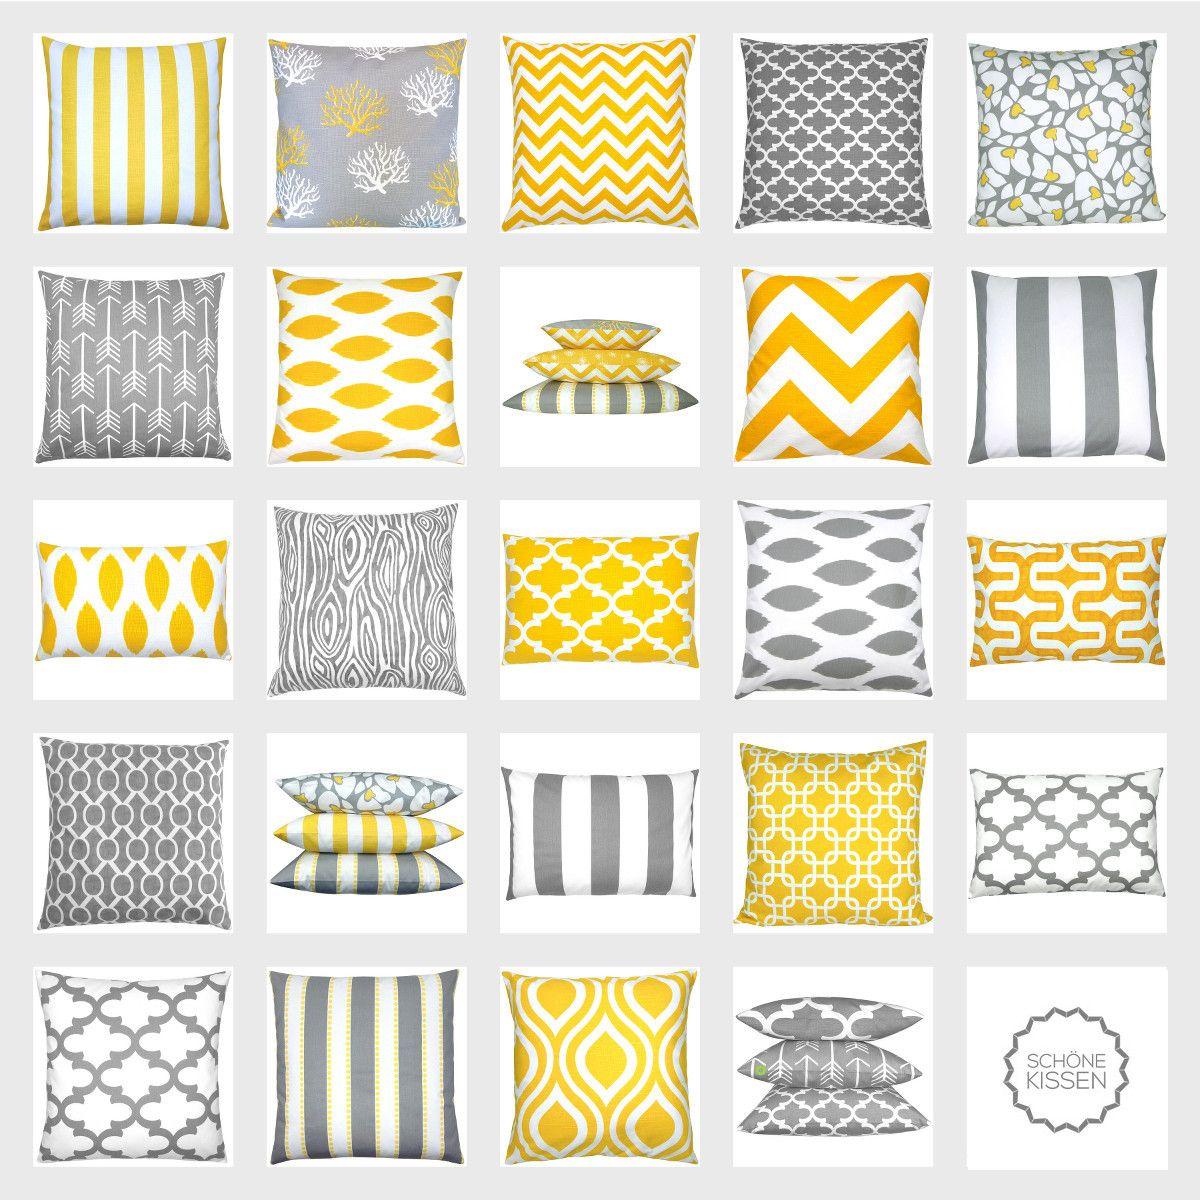 kissen kombination in gelb grau wei mit trendmuster. Black Bedroom Furniture Sets. Home Design Ideas